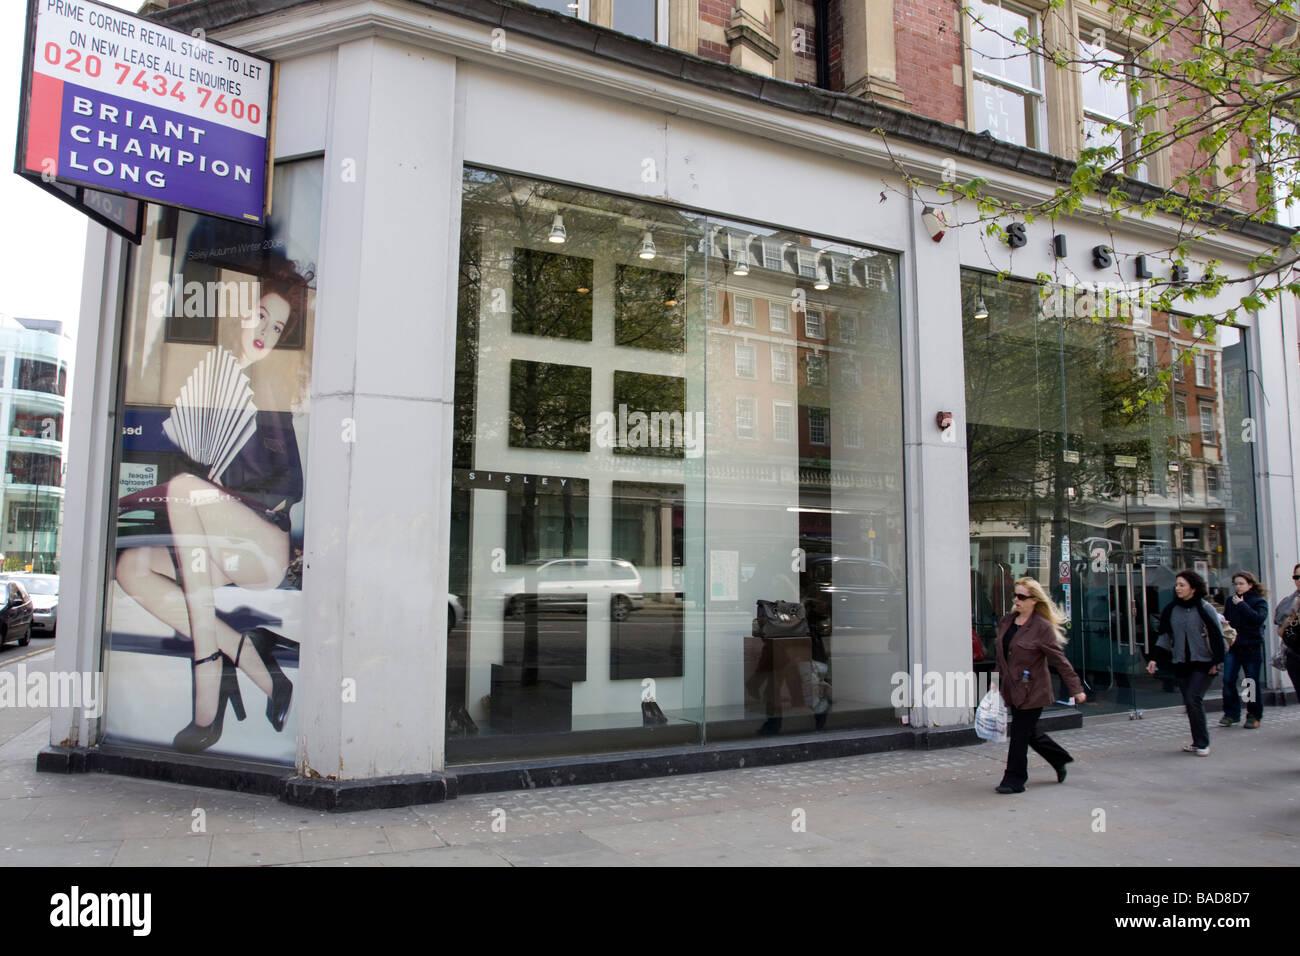 Vacant shop Kensington High Street London - Stock Image